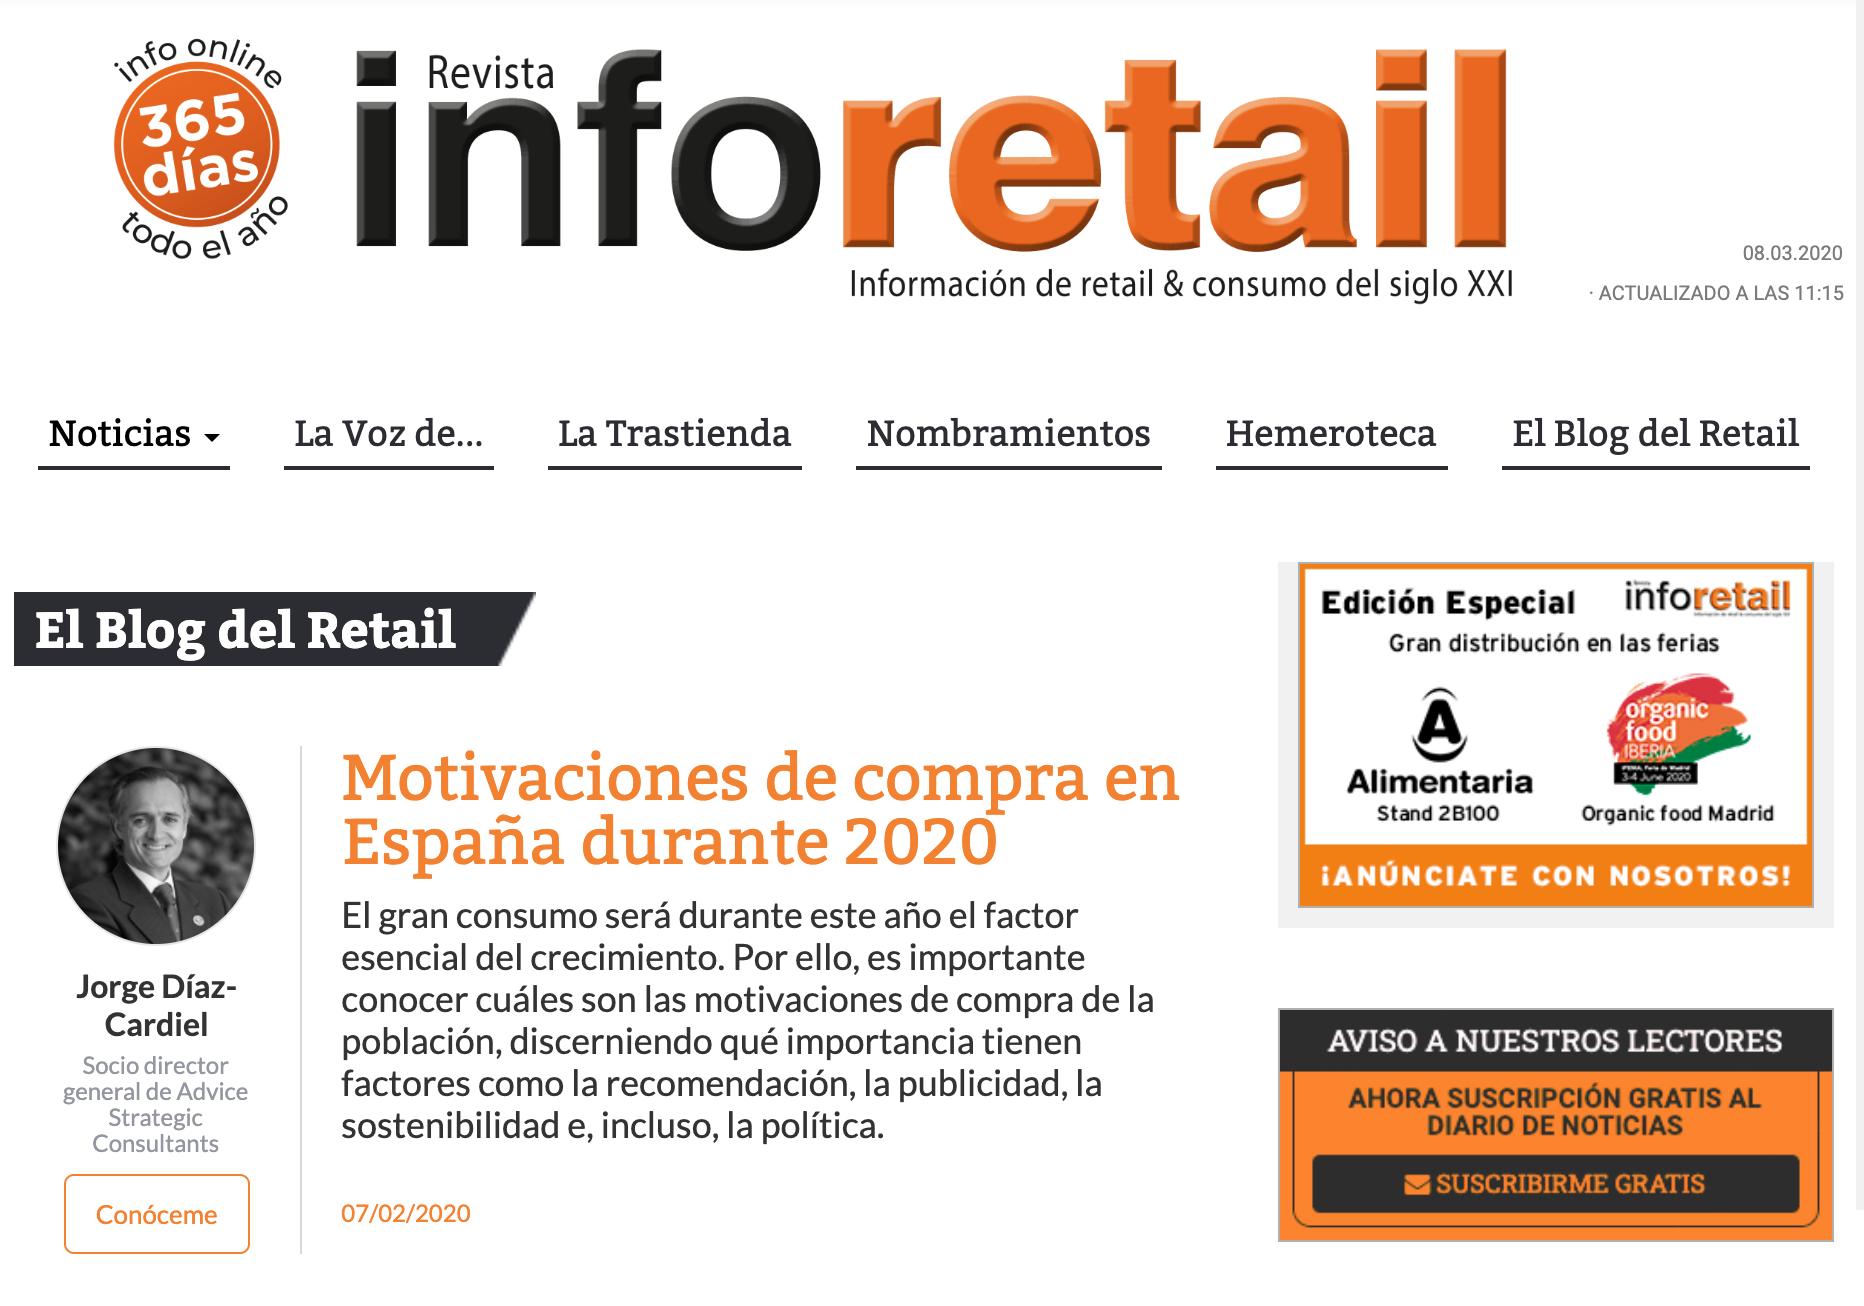 Article by Jorge Díaz-Cardiel in Revista Info Retail